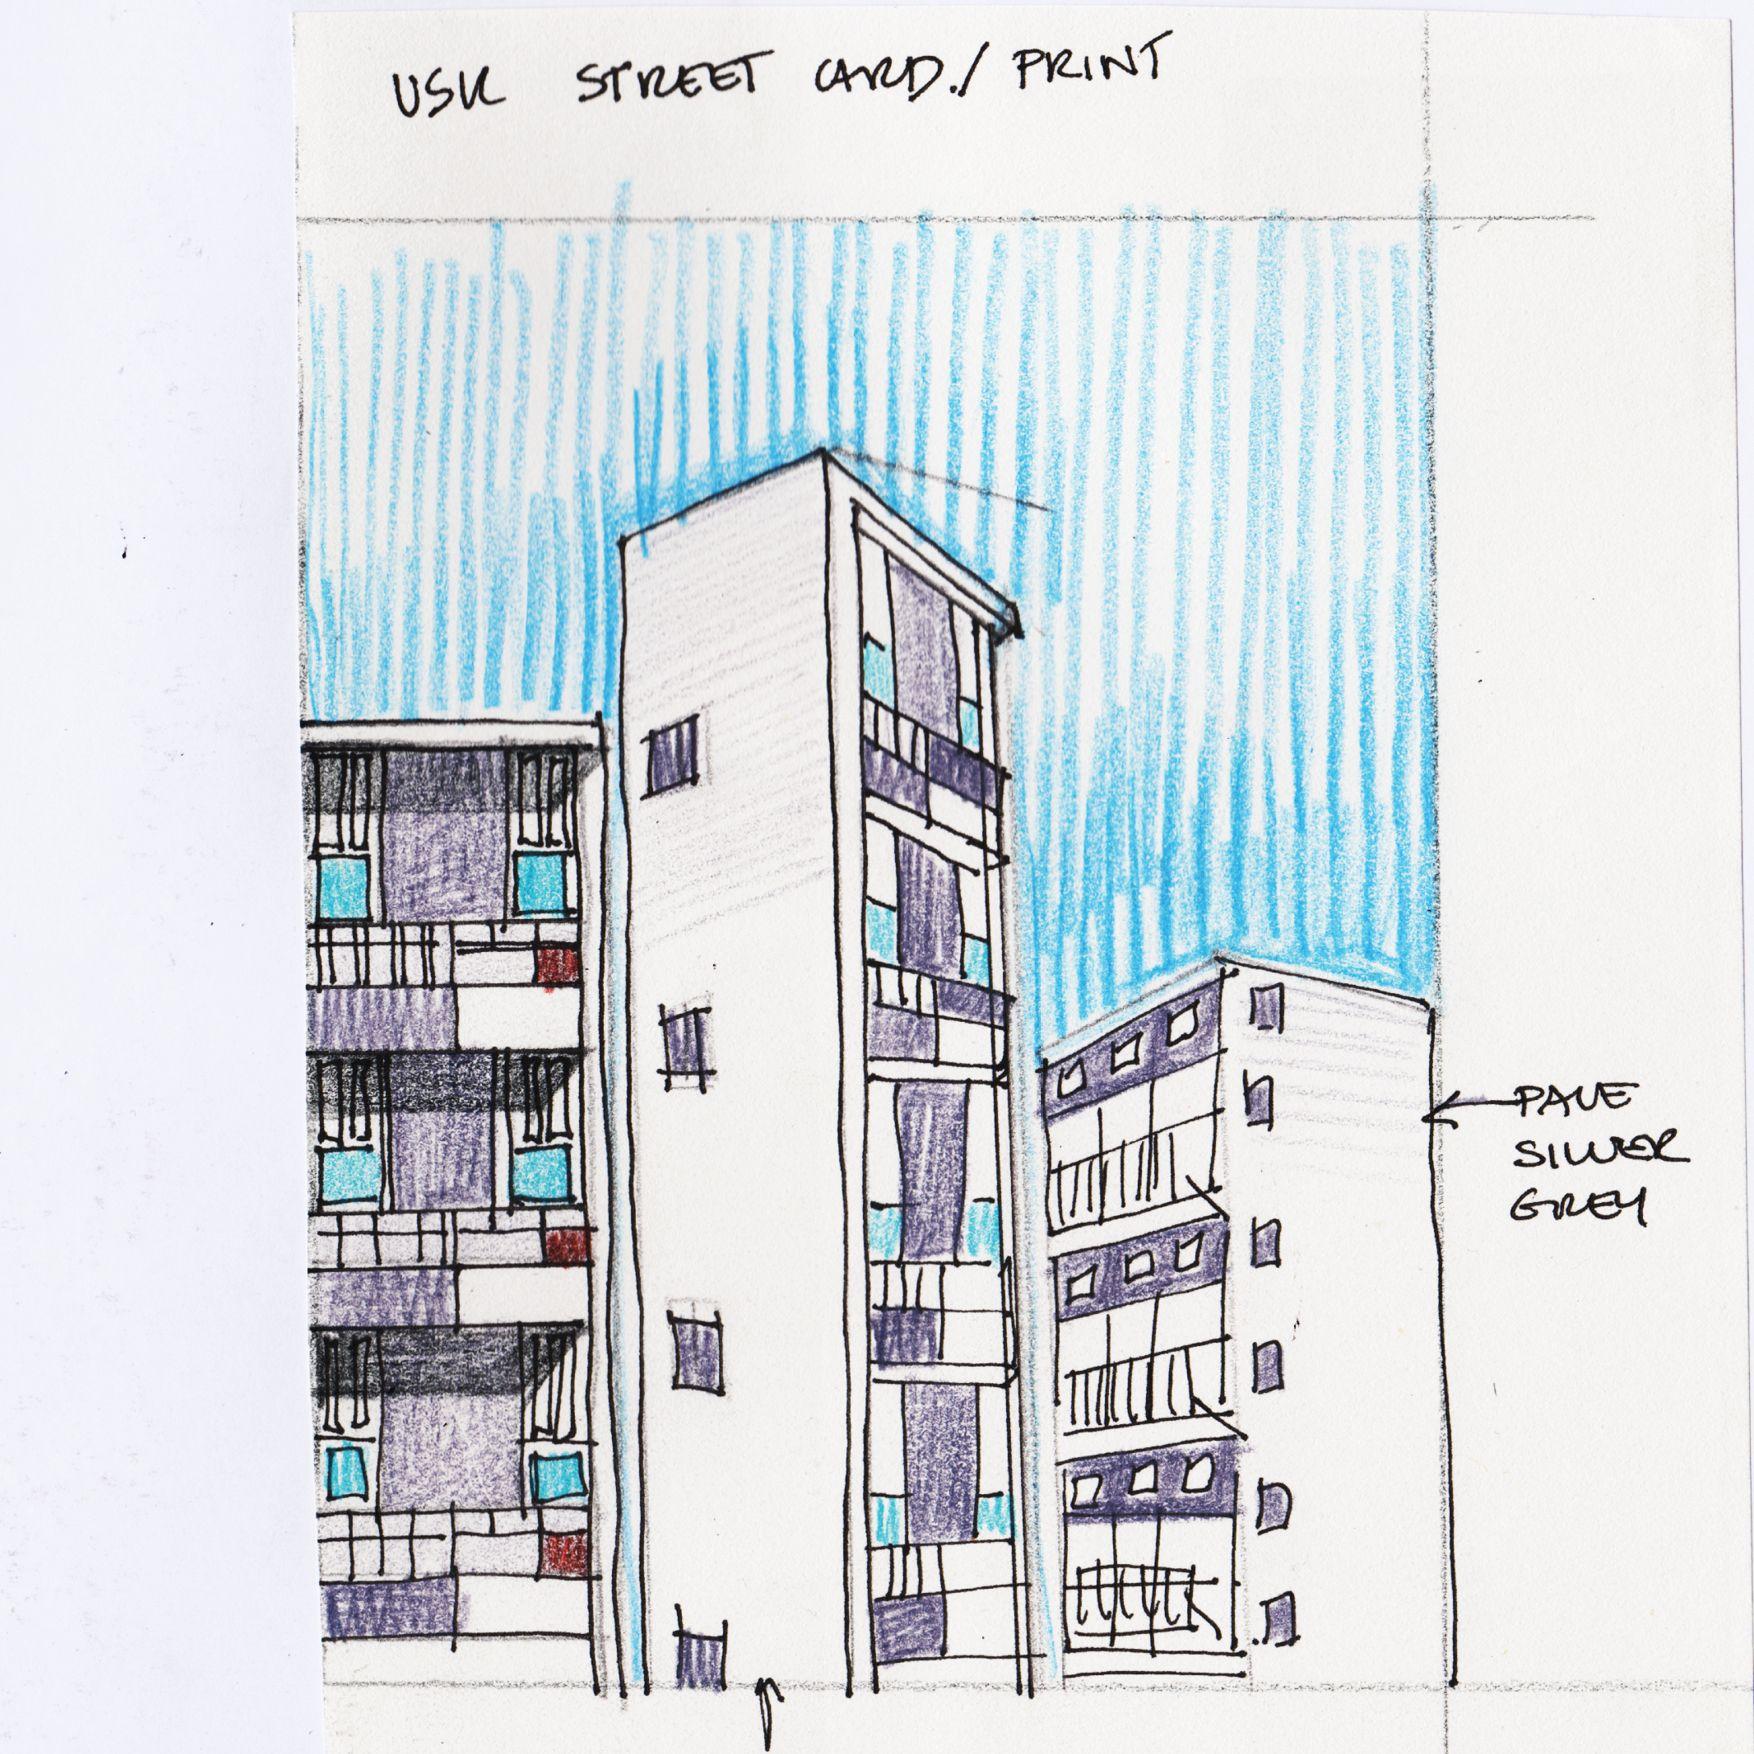 Sulkin House   Post Print Sketch   London E2 Architect Denys Lasdun. Hand  Drawings1960sArchitects